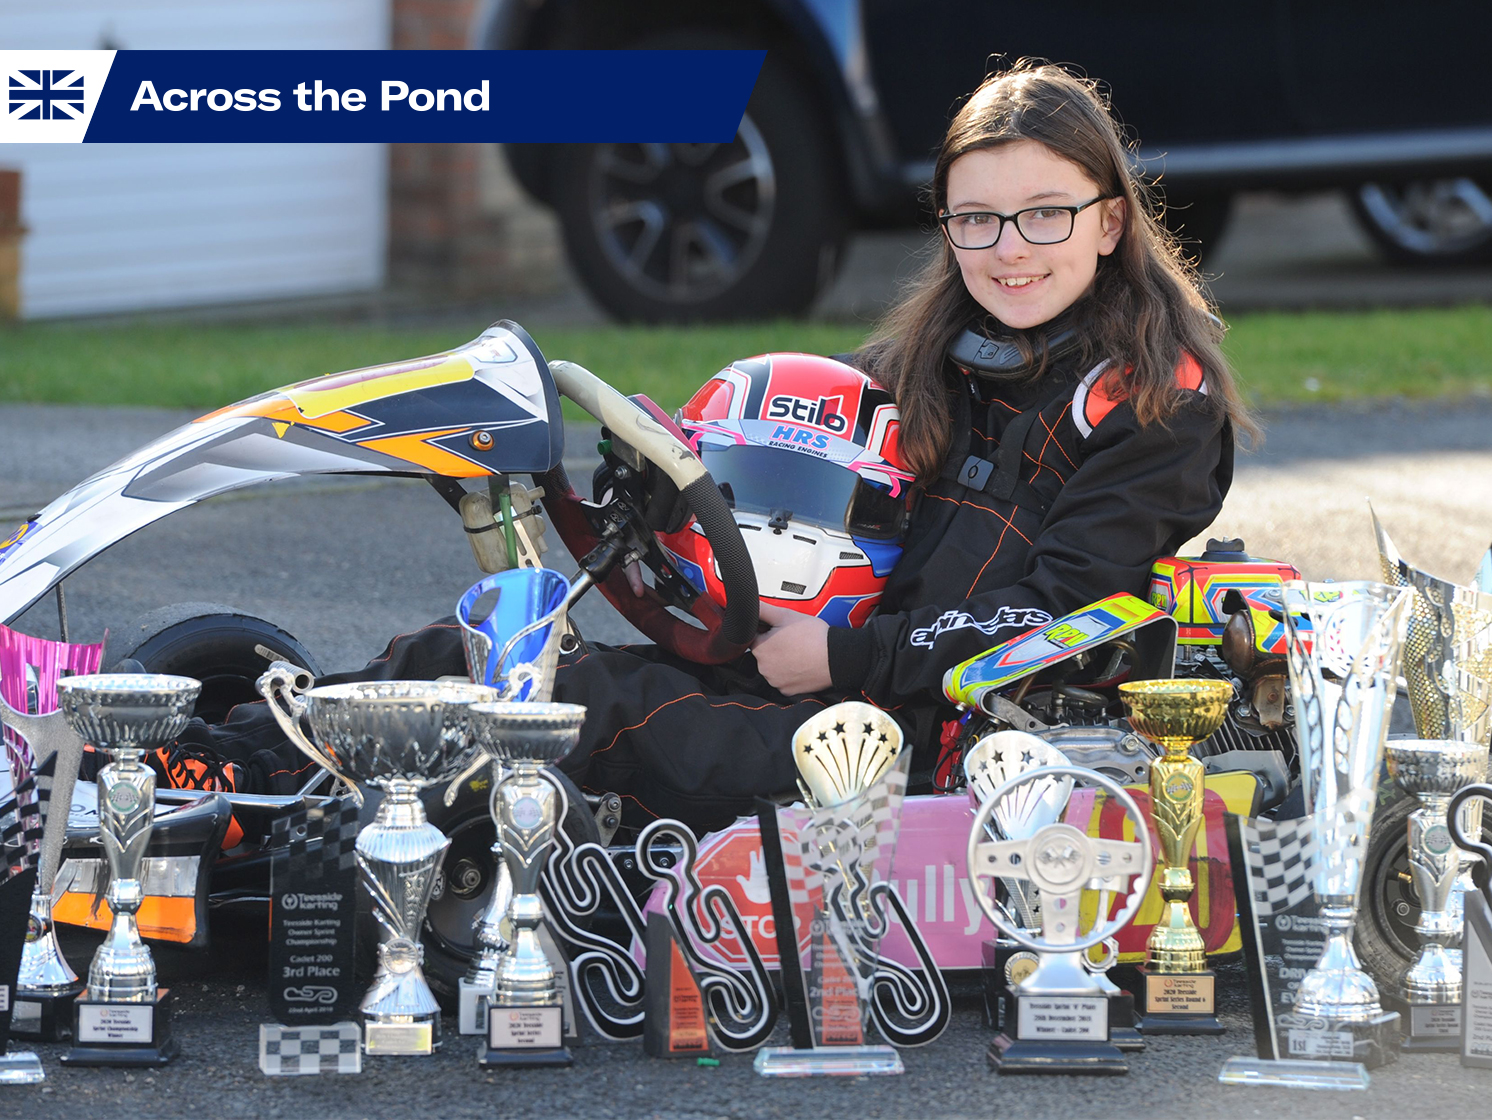 catherine potter kart racing across the pond lede